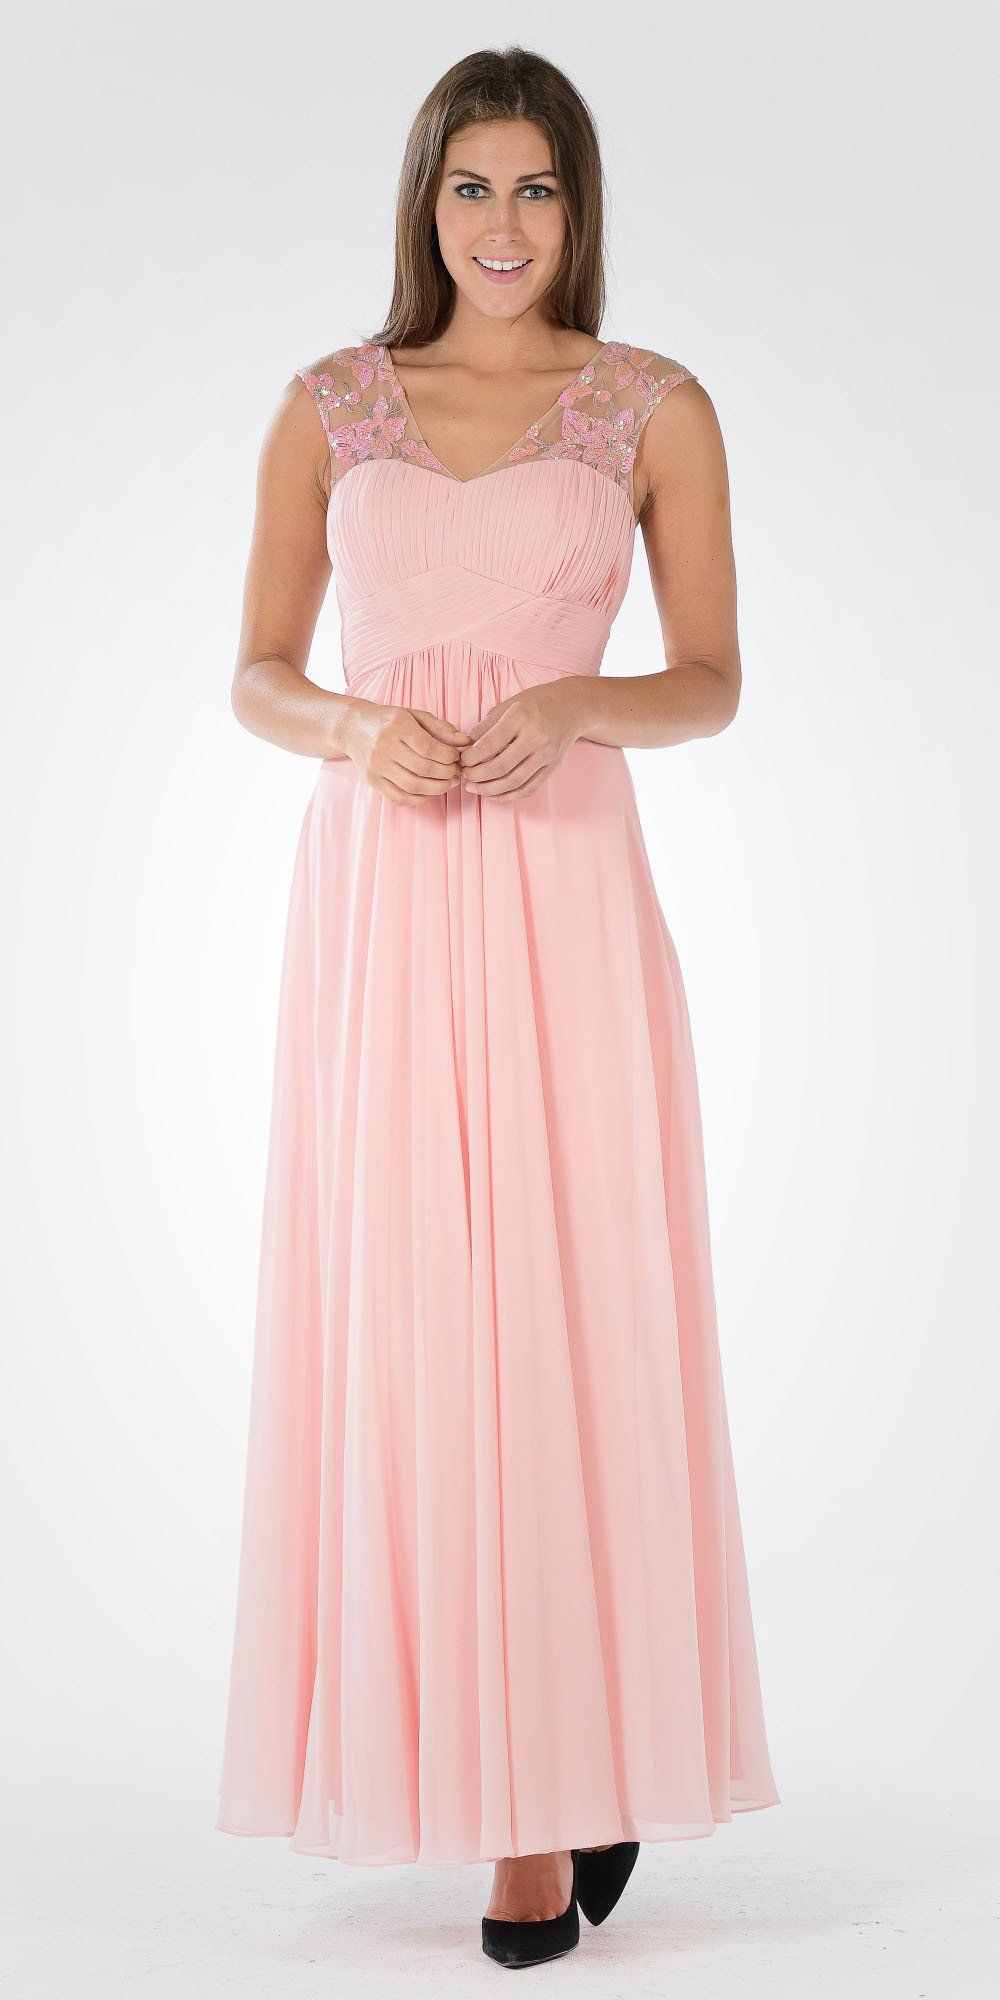 4bacb2b17760 V-Neck Embellished Pleated Bodice Empire Waist Formal Dress Long Gray